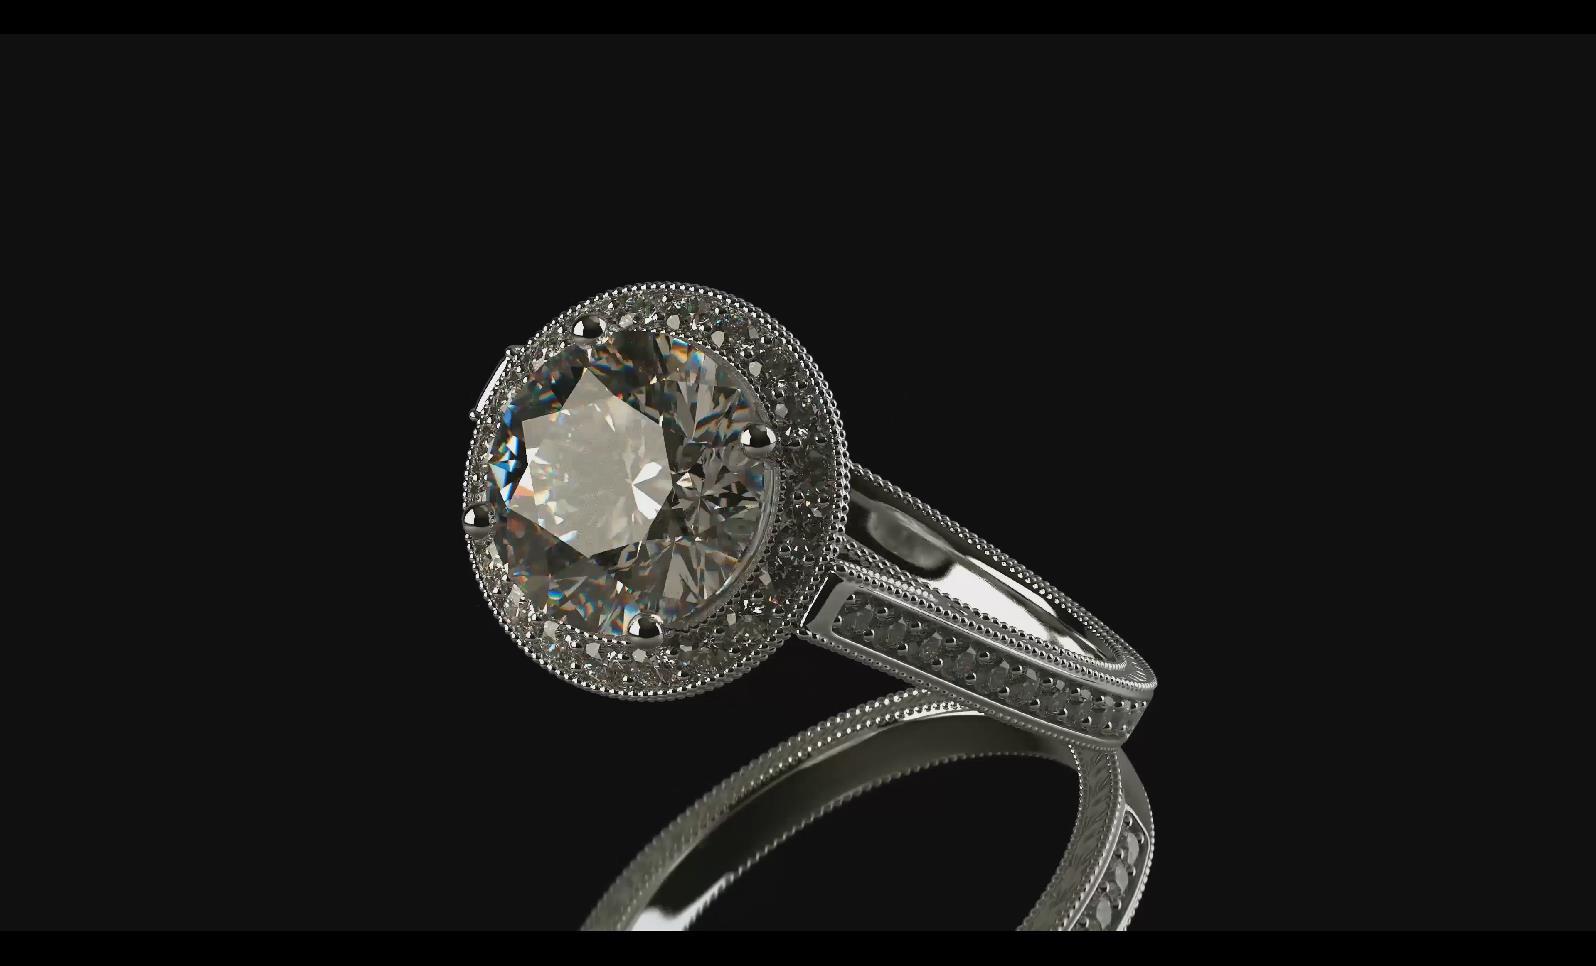 BS 086 BS 66 4K钻戒展示 珠宝工艺 珠宝设计 珠宝展示_4